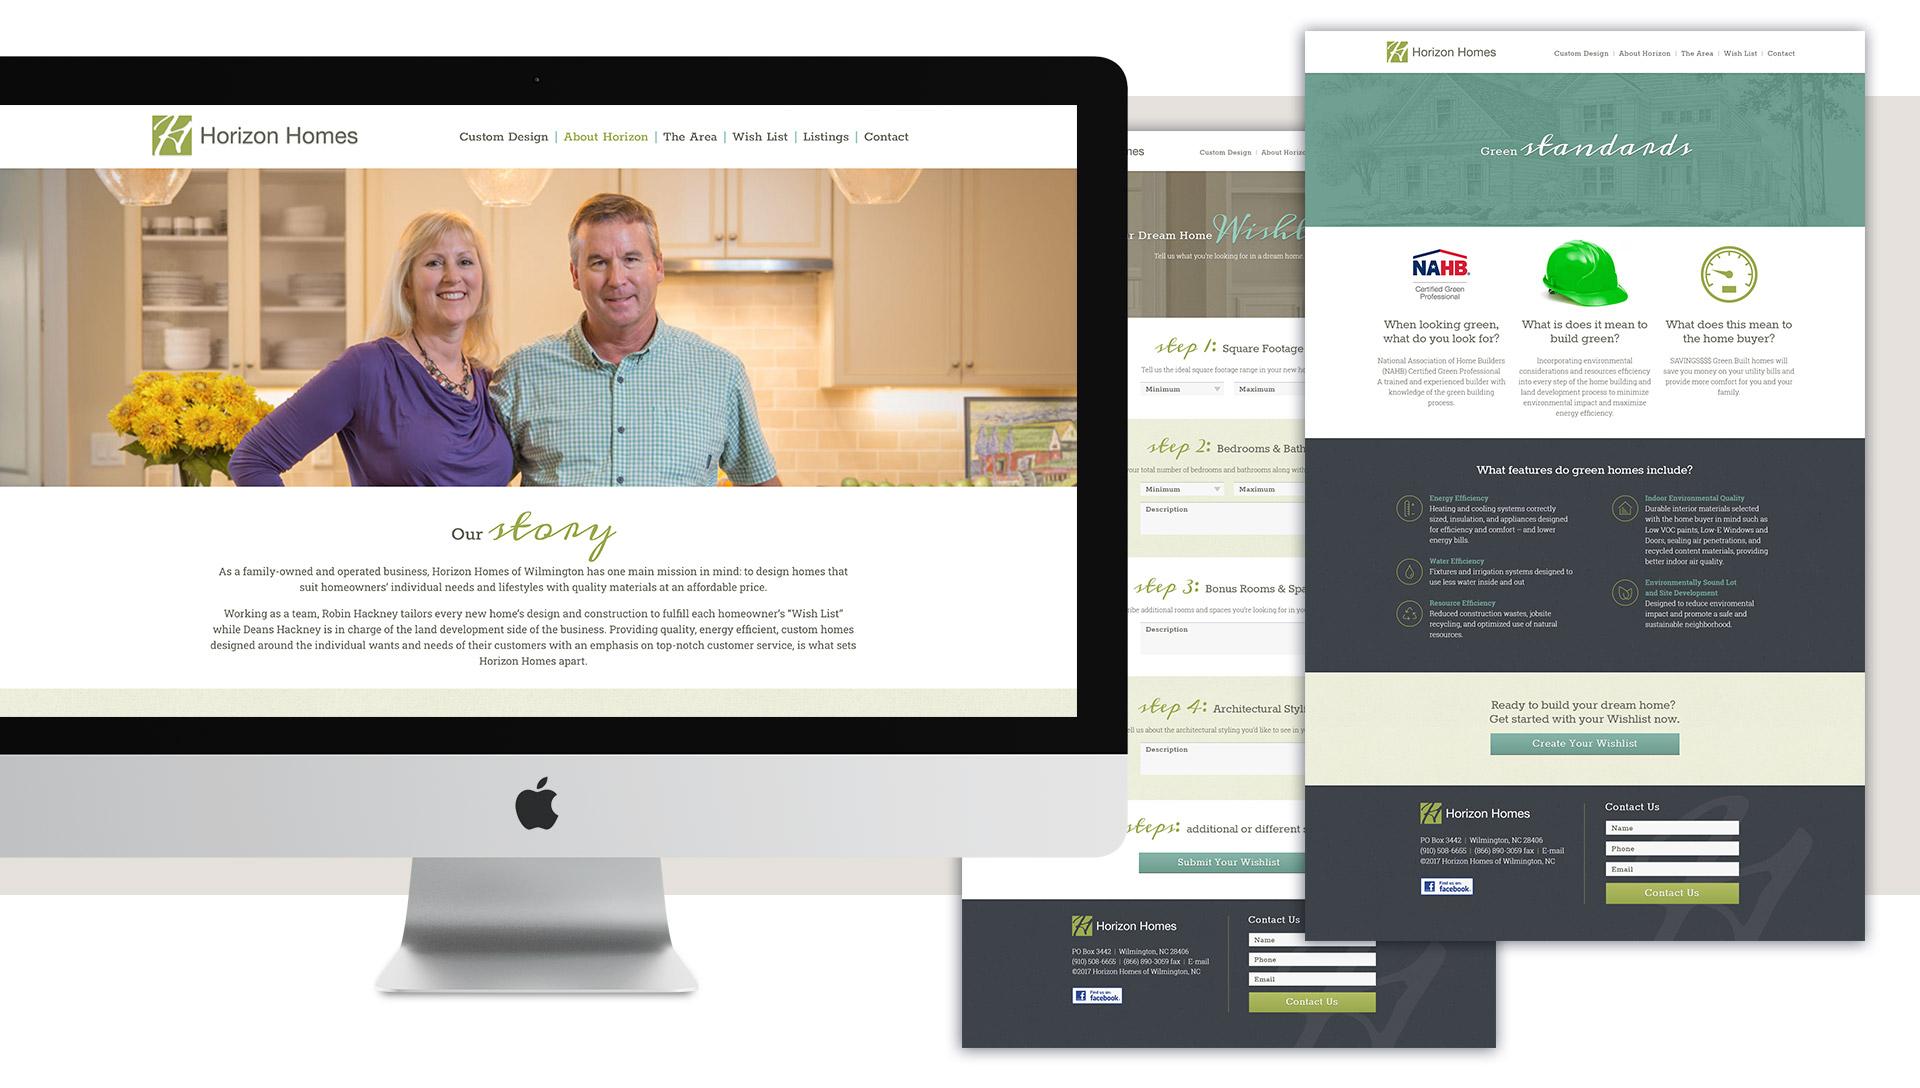 Horizon Homes - Website Design by Springer Studios, Wilmington, NC